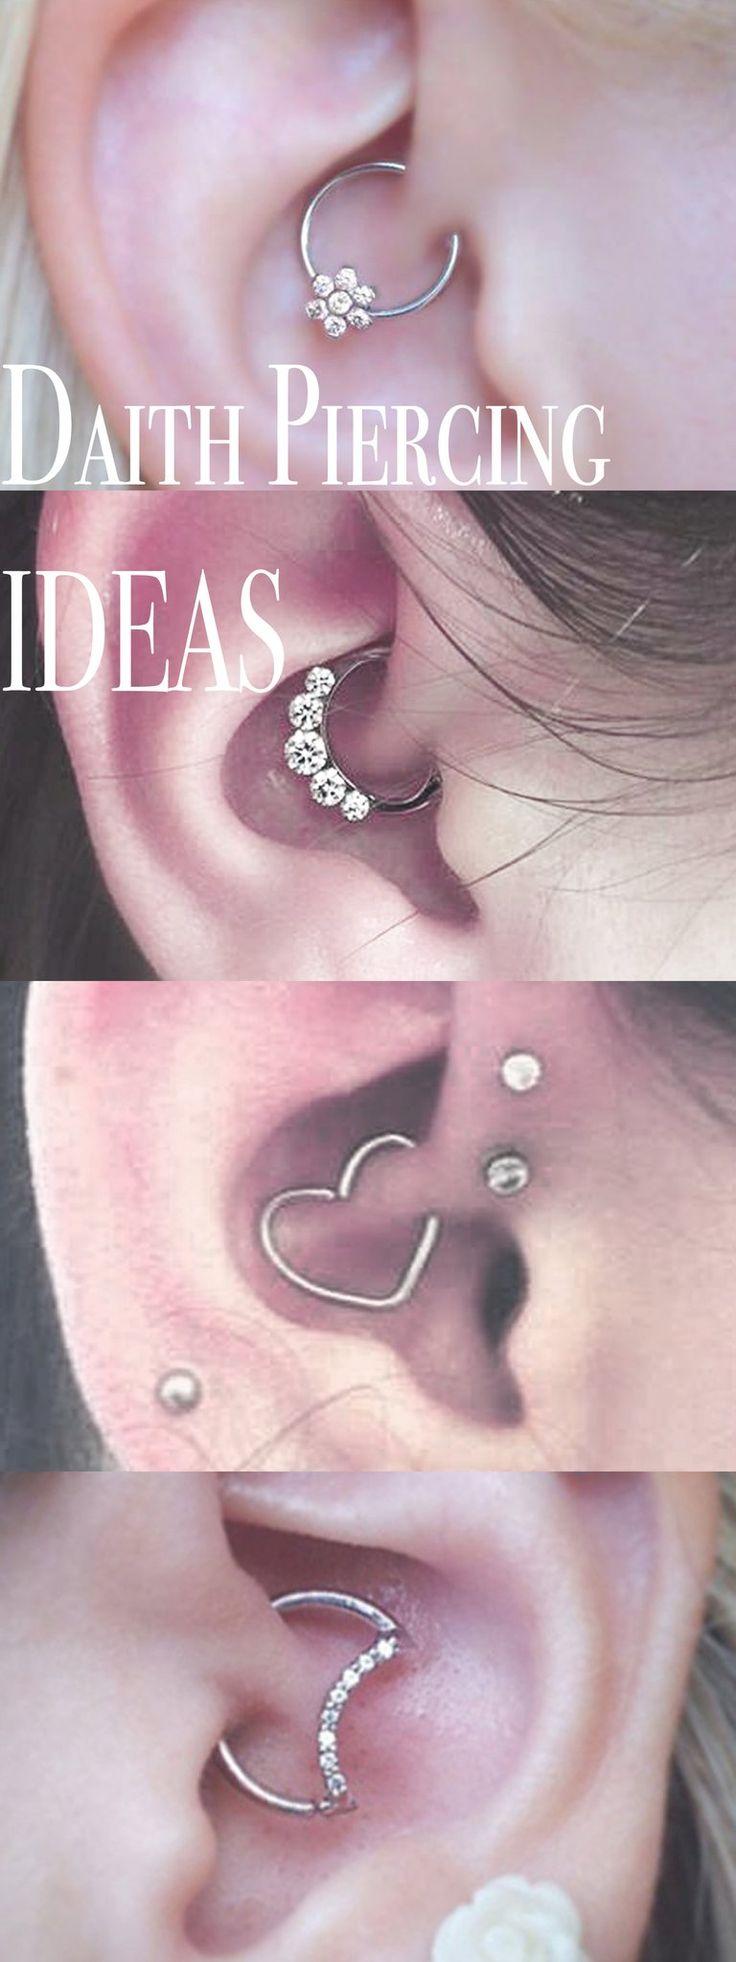 Pressure bump piercing   best Body Mod Ideas images on Pinterest  Tattoo ideas Deer and